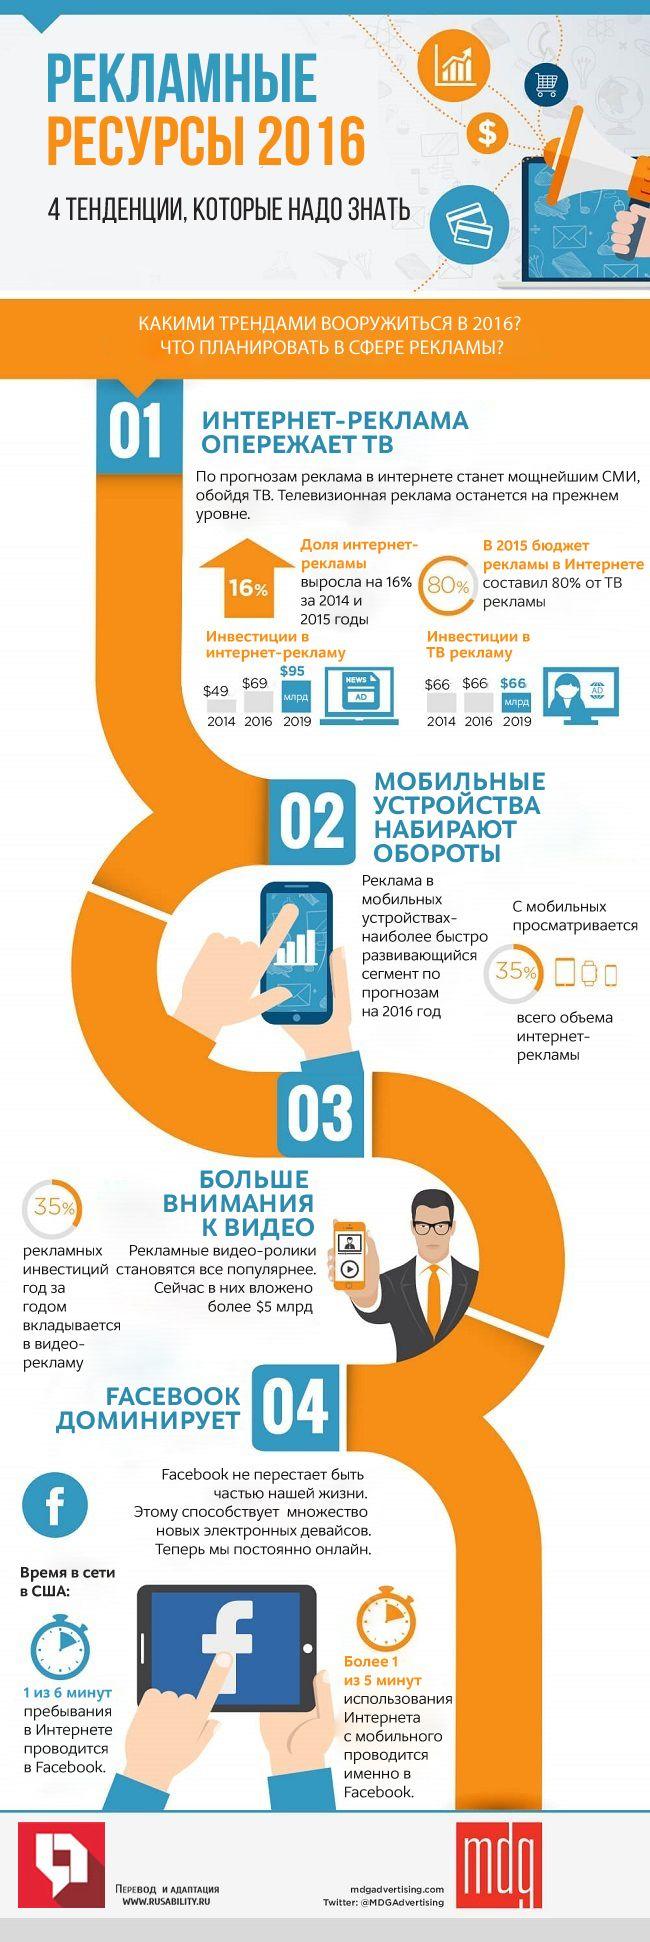 Рекламные тренды 2016. Инфографика - Rusability маркетинг, интернет-маркетинг…